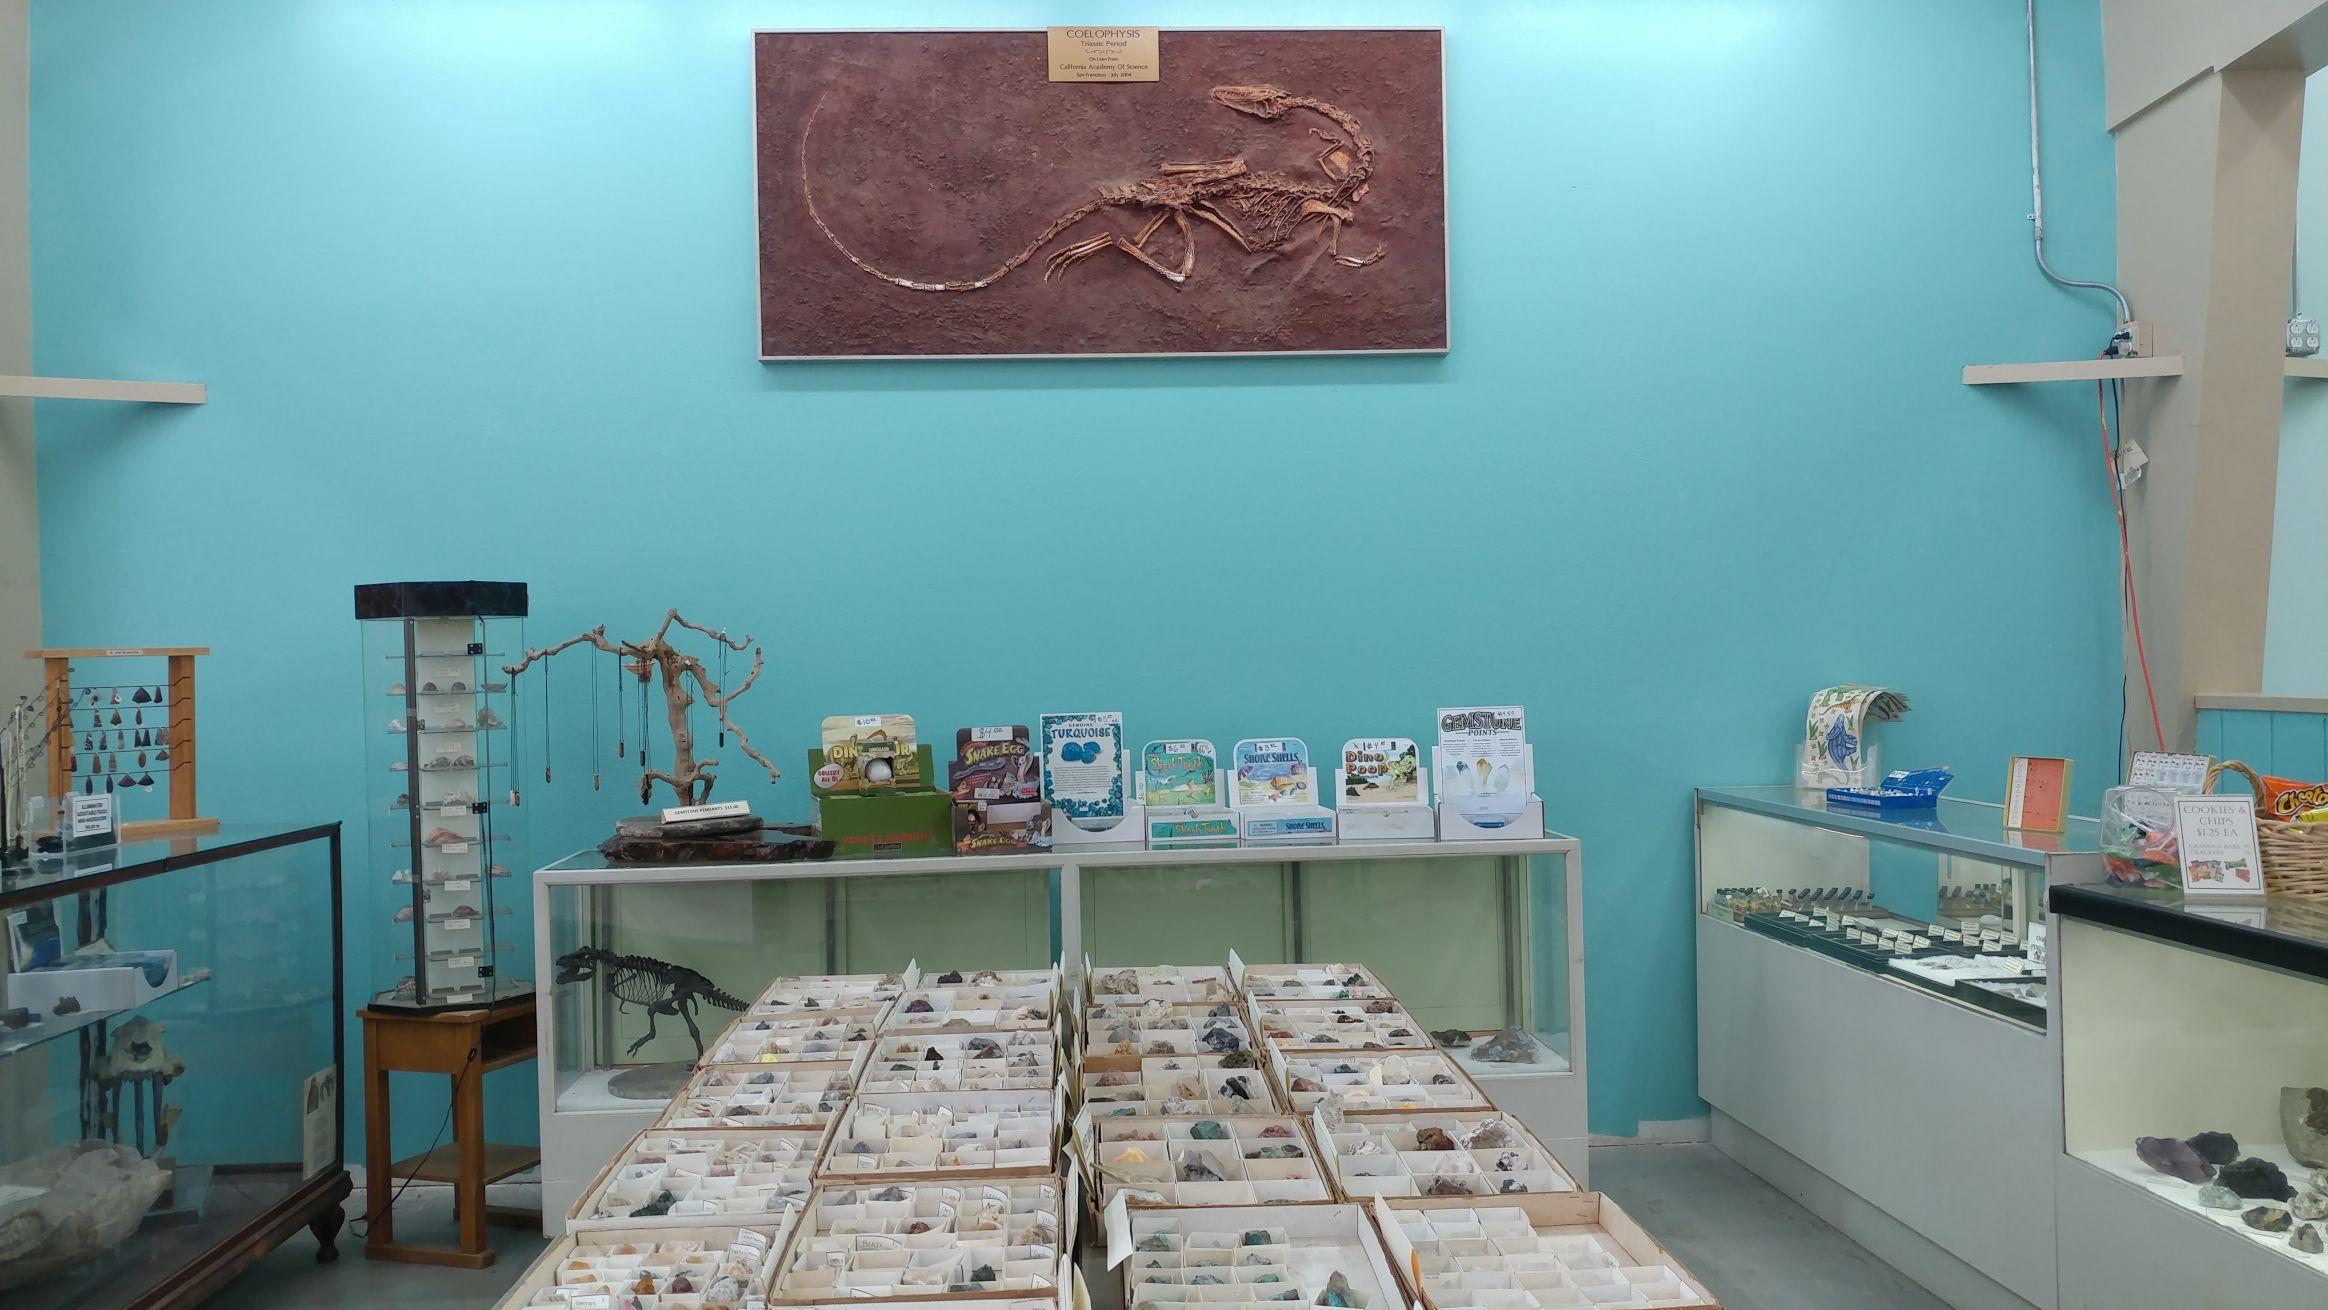 jmdc gift shop